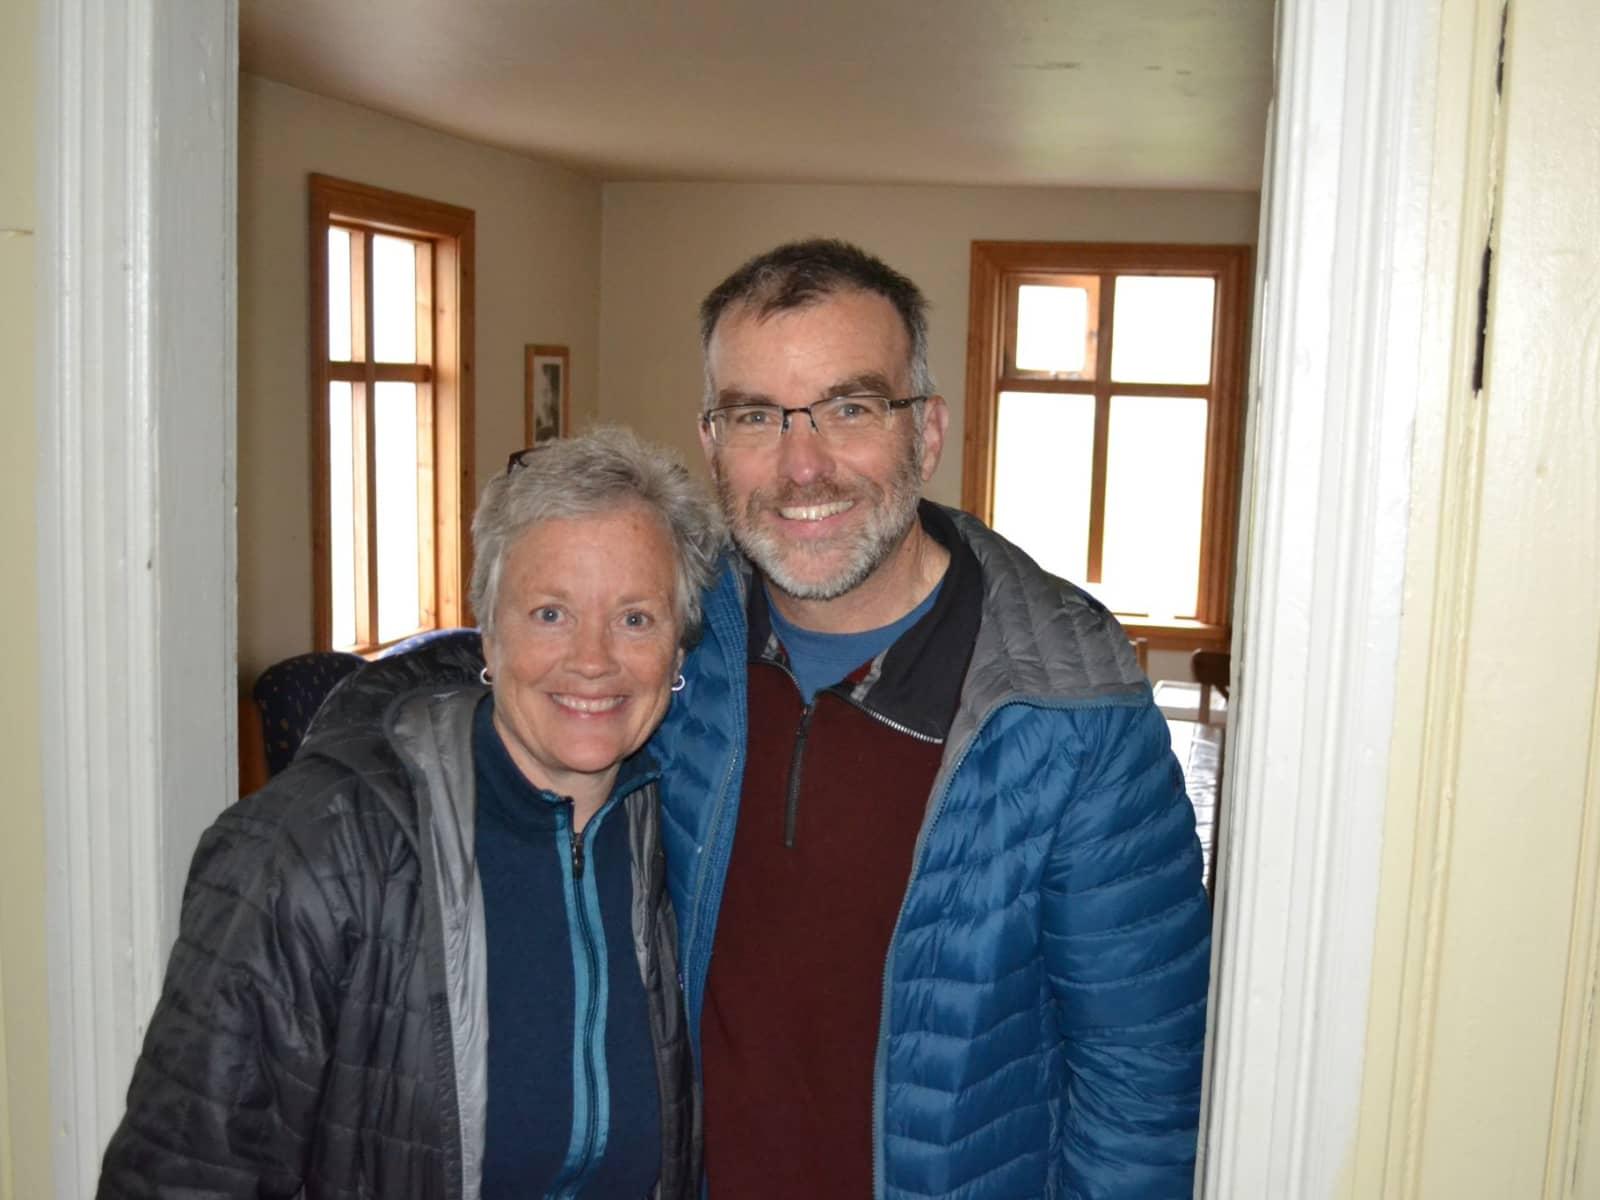 Kathleen & Kevin from Batavia, Illinois, United States